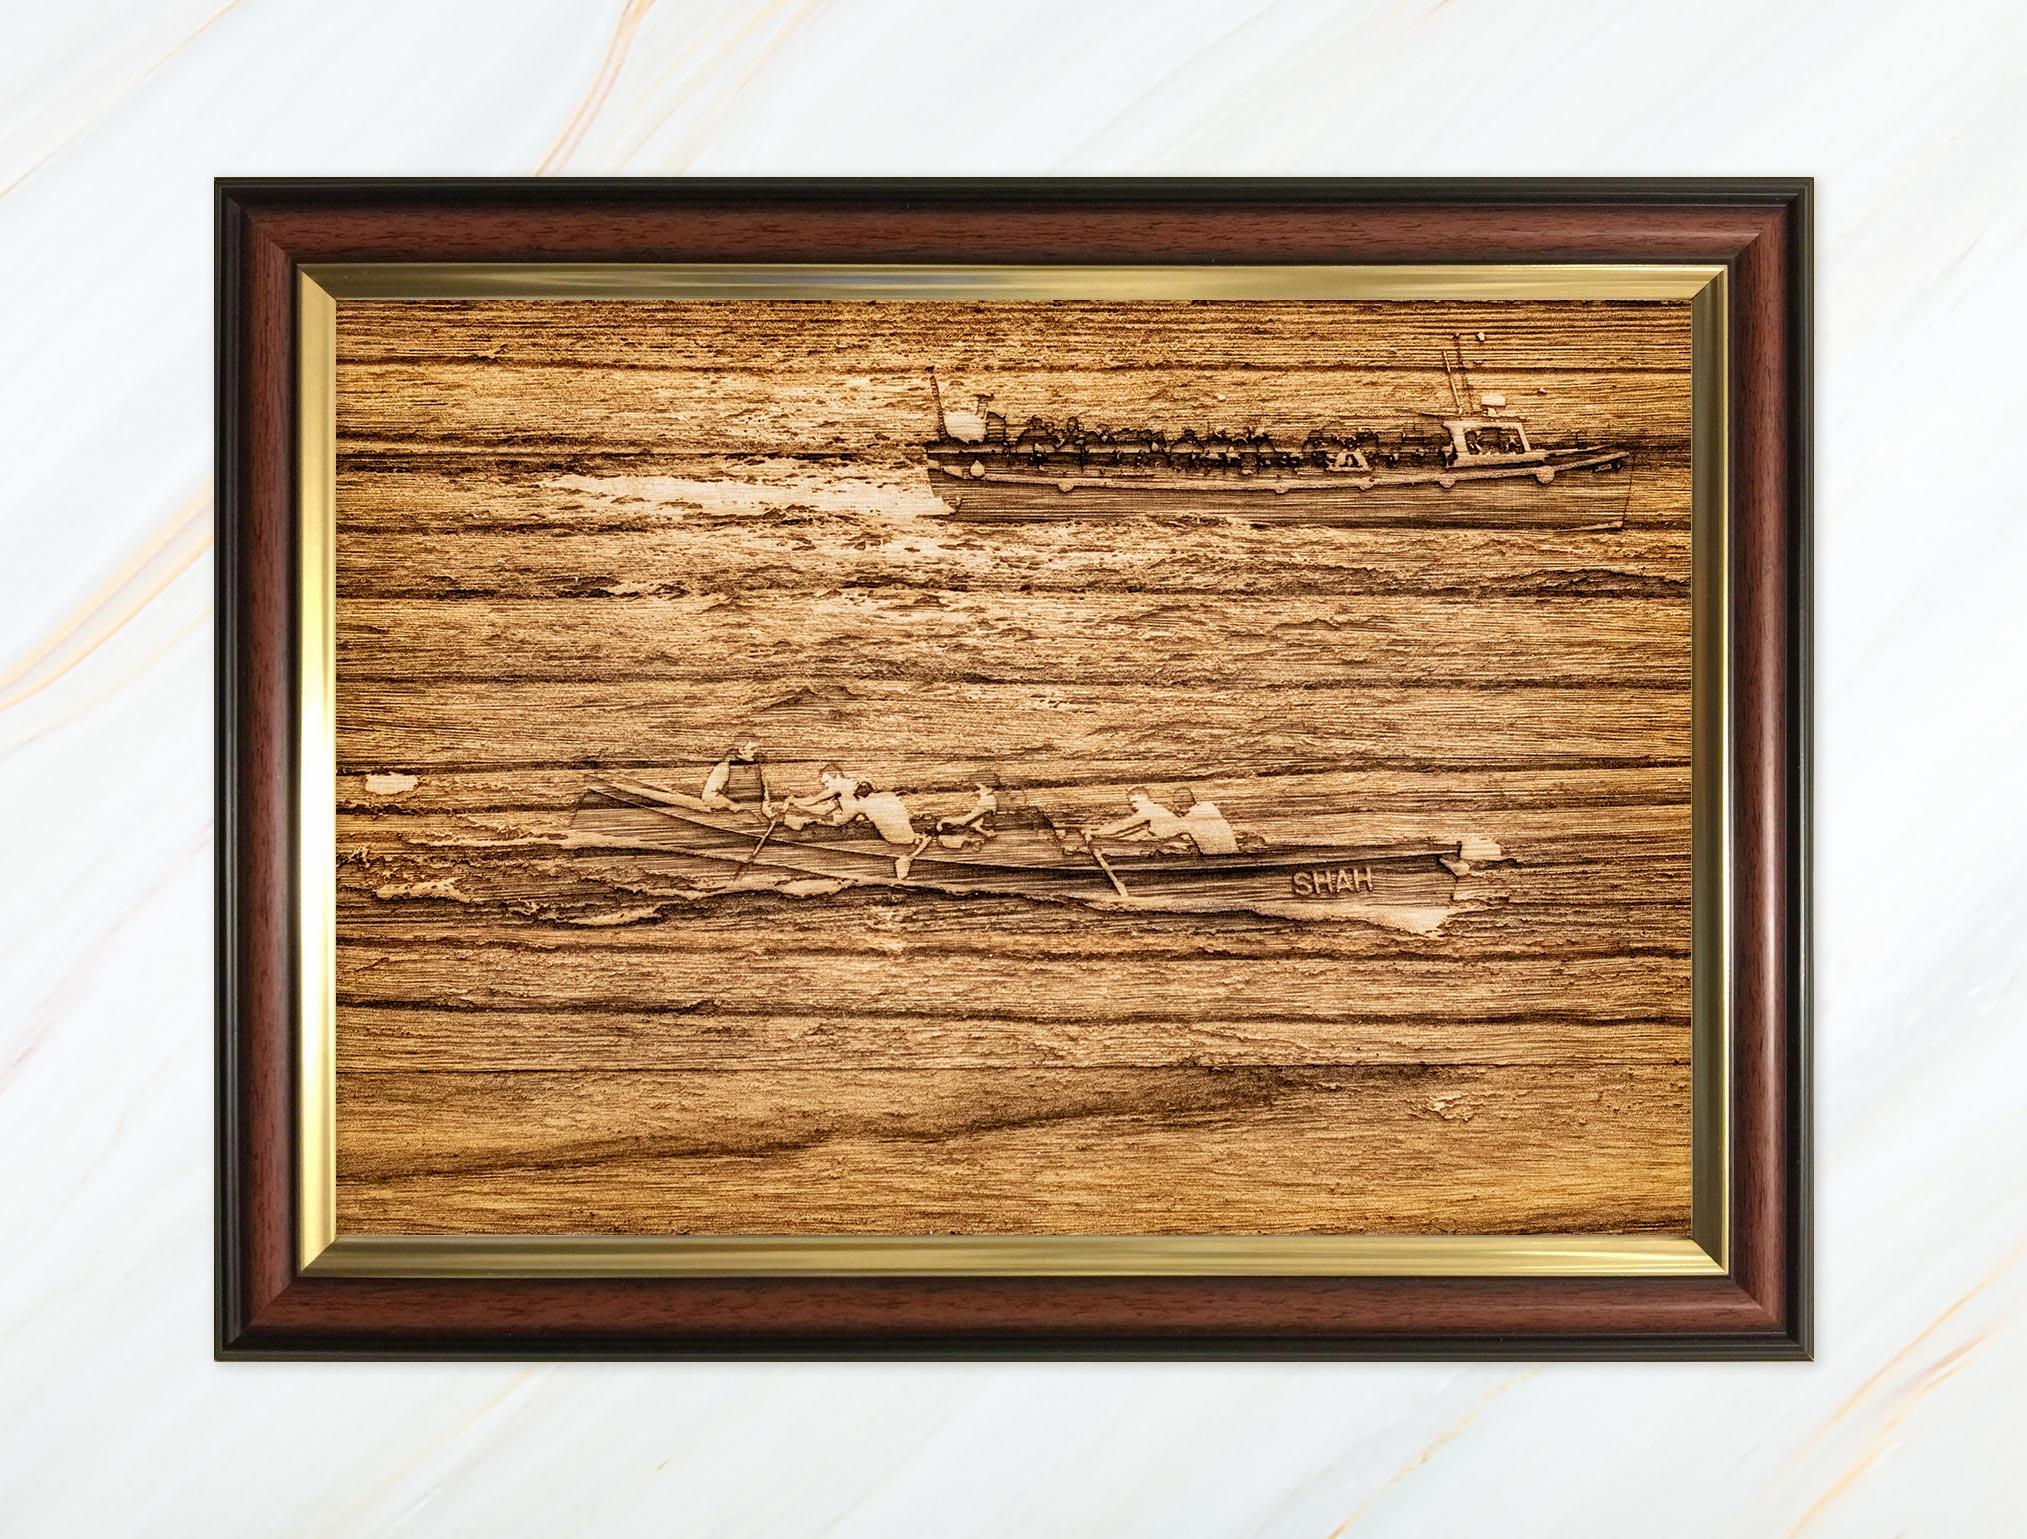 Wooden pyrograph of Shah racing